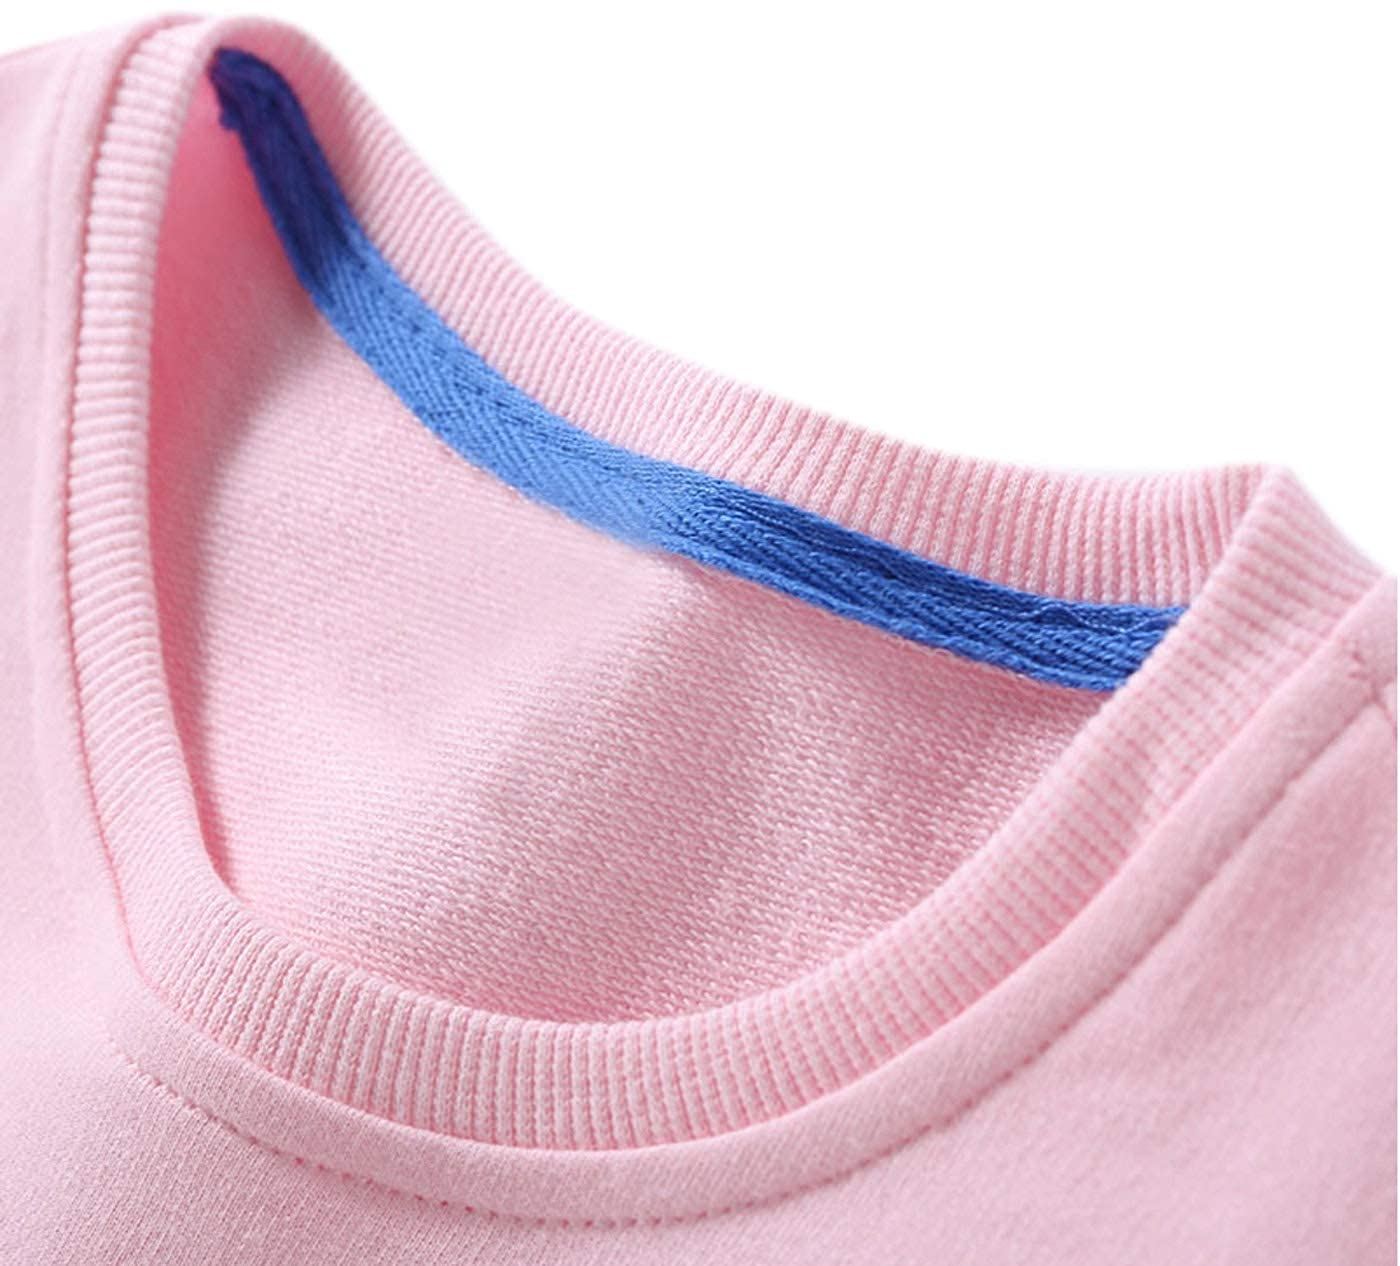 Boys Girls Cotton Pullover Christmas Sweatshirts Crewneck Sweater Tops Bear and Snowflake Printed 2-6T